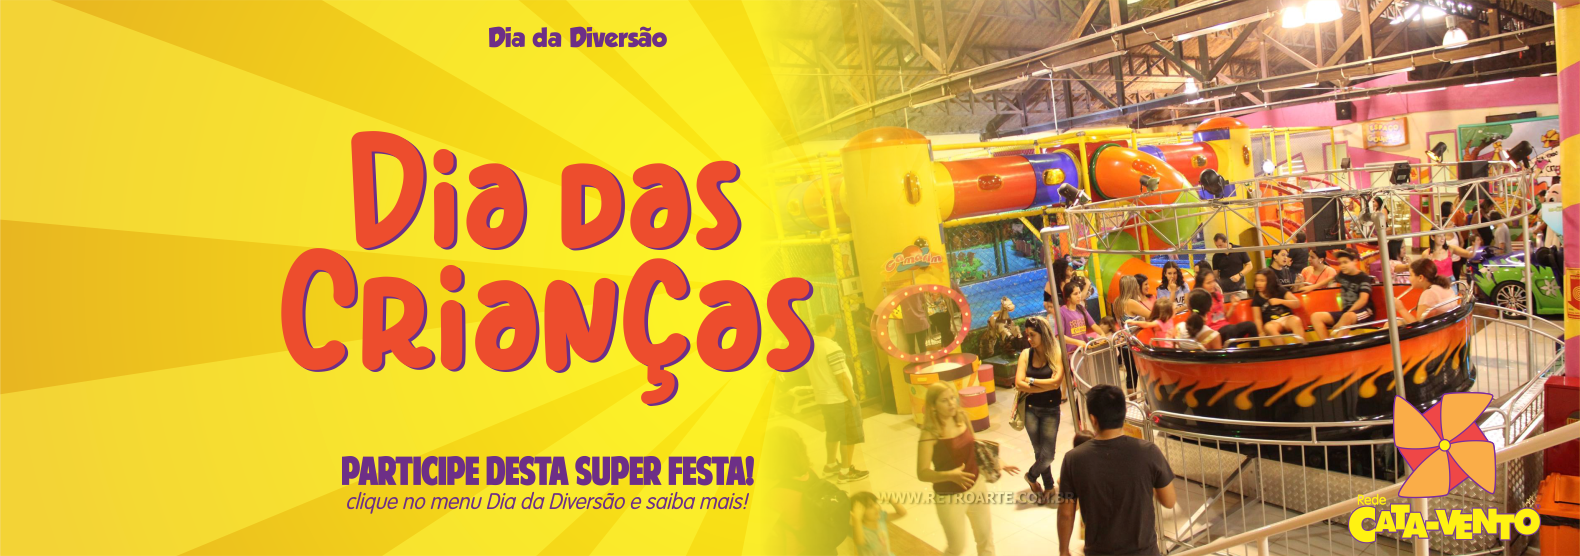 Swell Buffet Cata Vento A Maior Rede De Festas Do Brasil Interior Design Ideas Apansoteloinfo